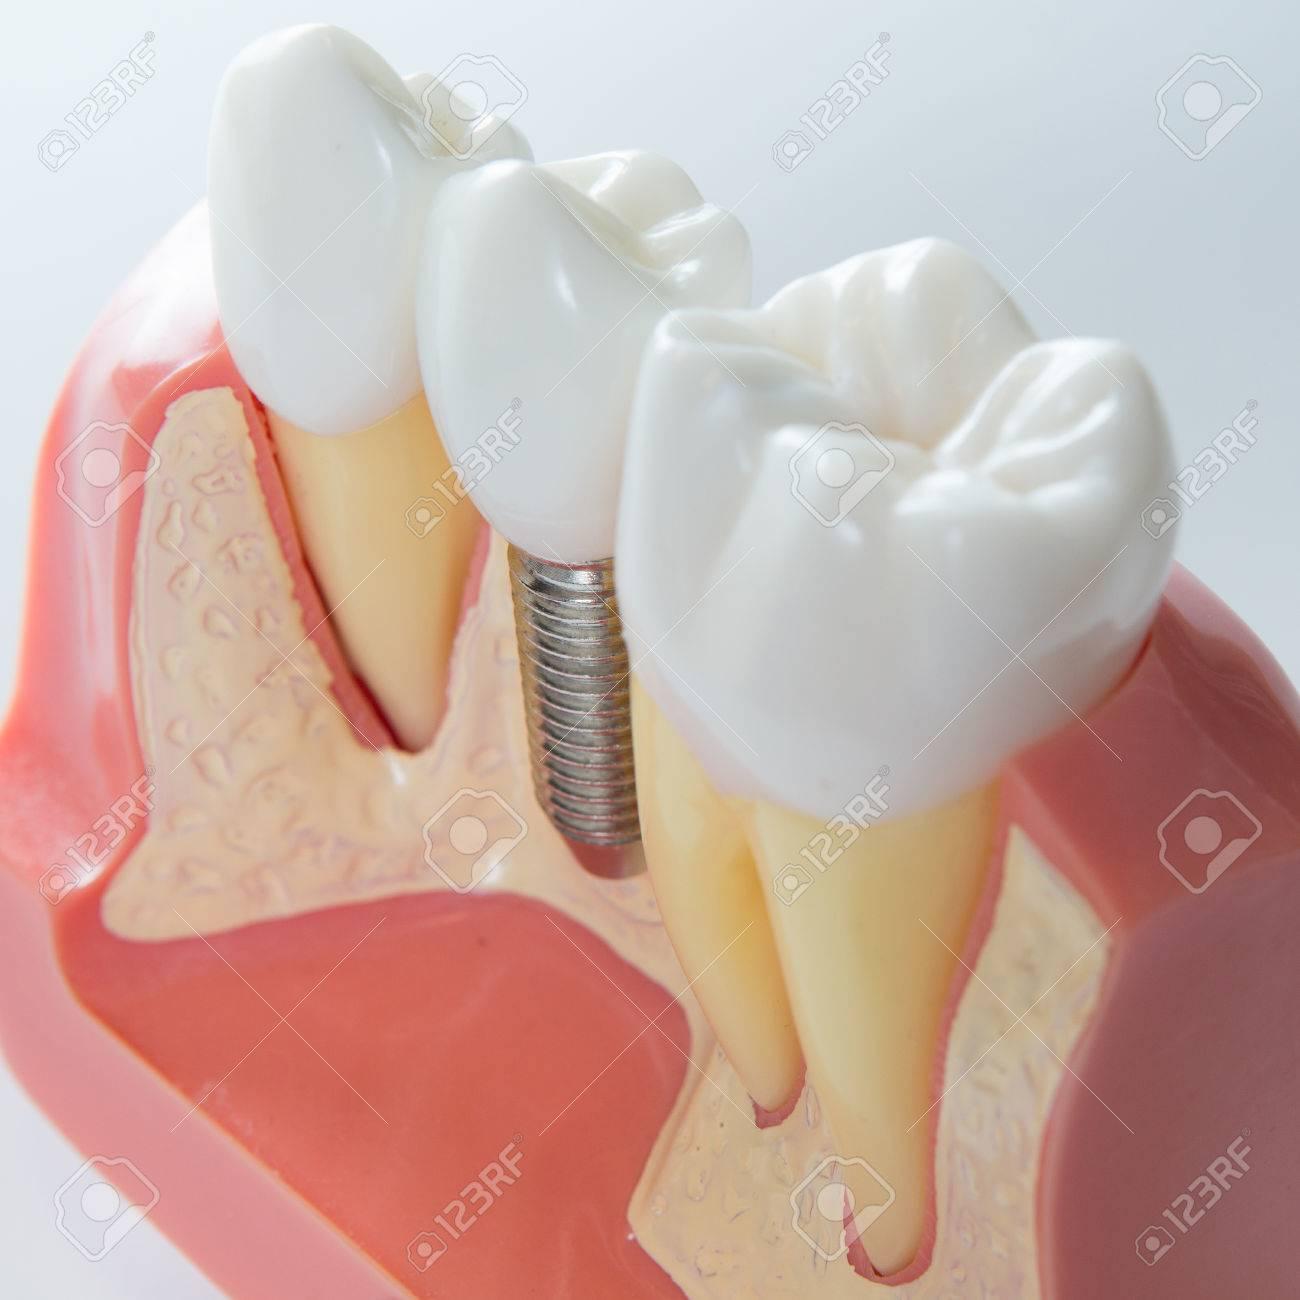 Close up of a Dental  implant model. Selective focus. Standard-Bild - 35280970